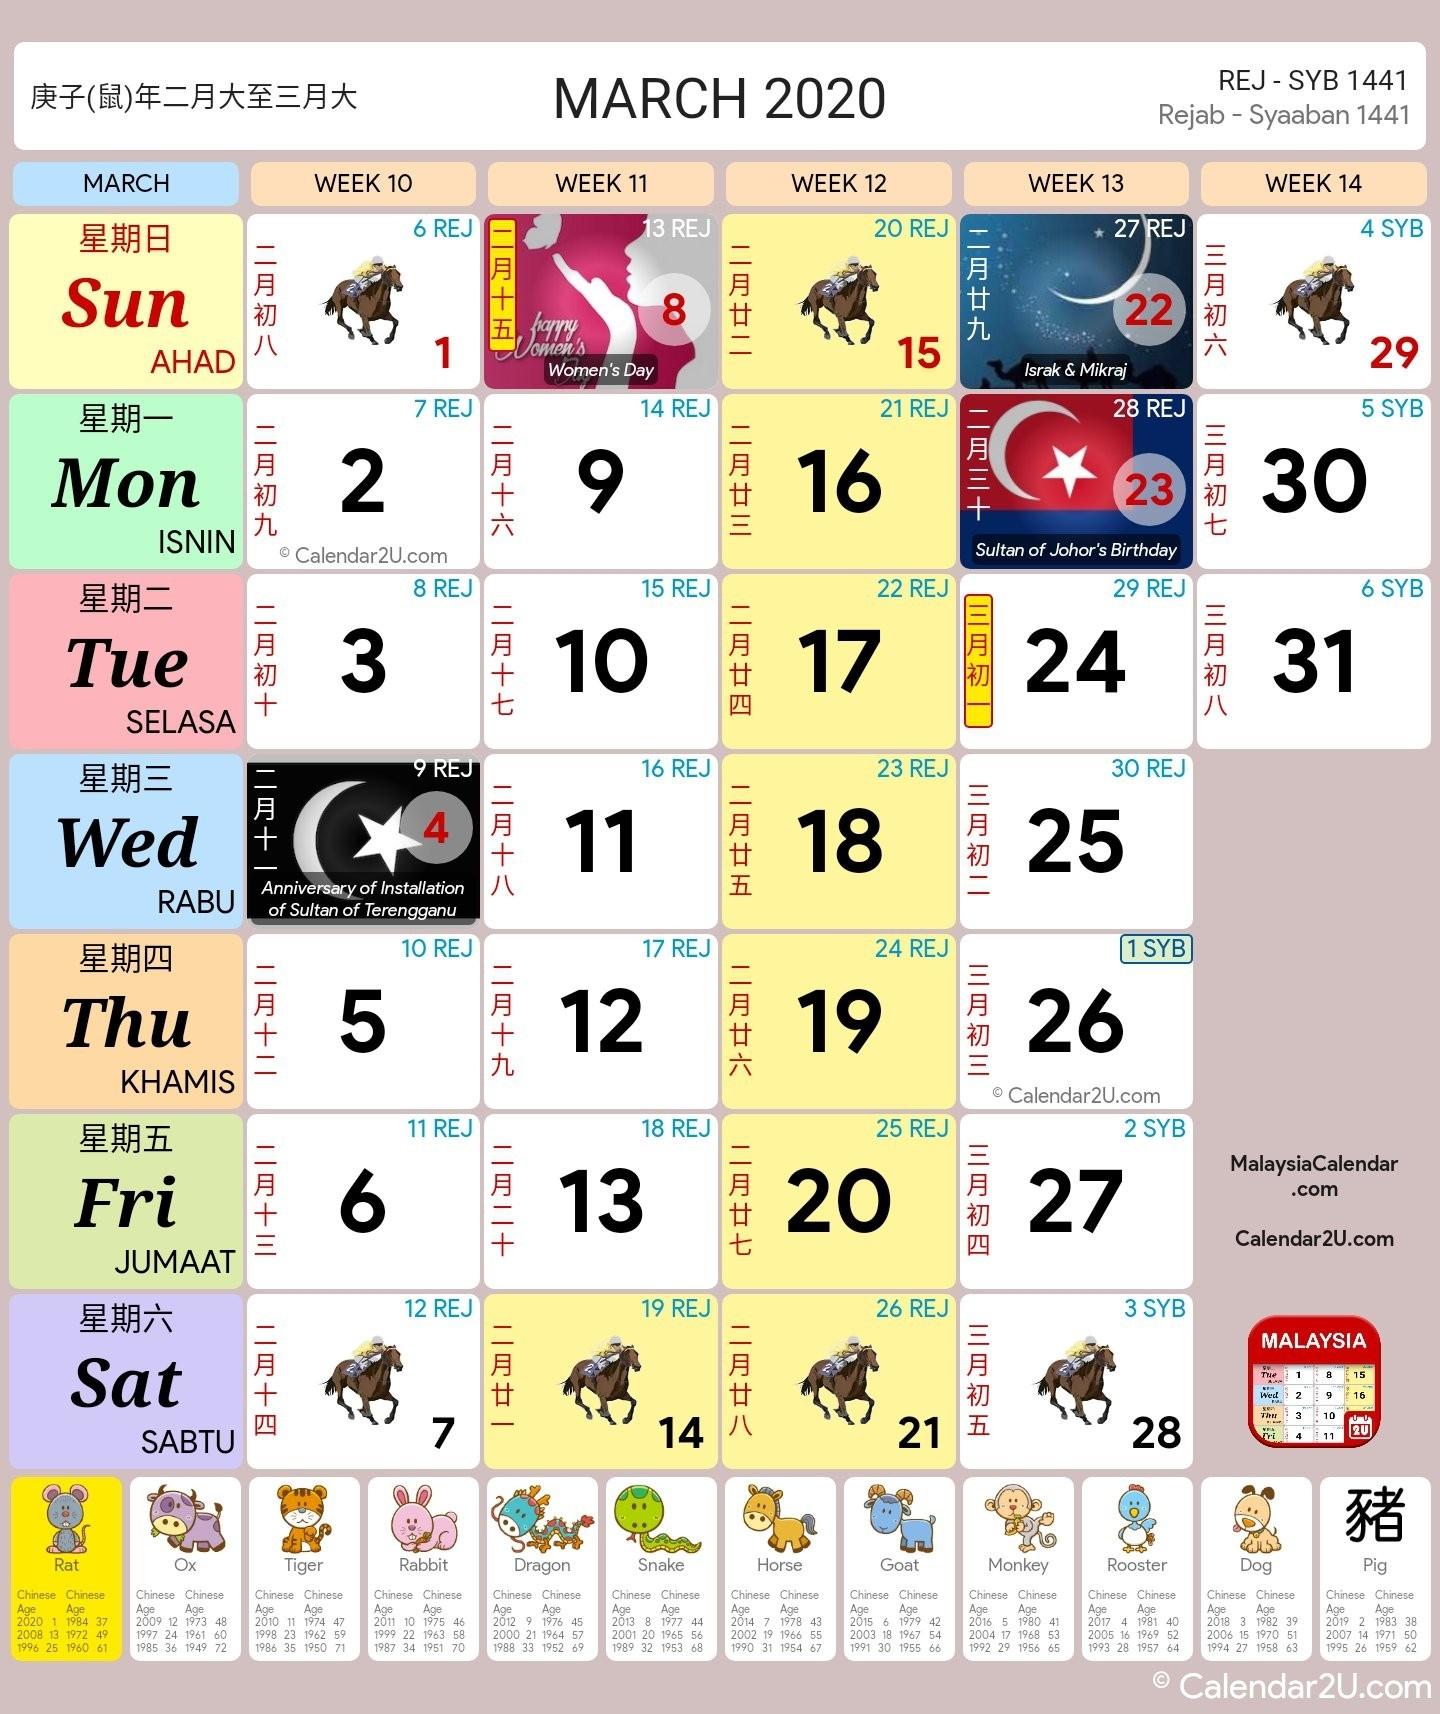 Malaysia Calendar - Blog-Malaysia School Holidays 2020